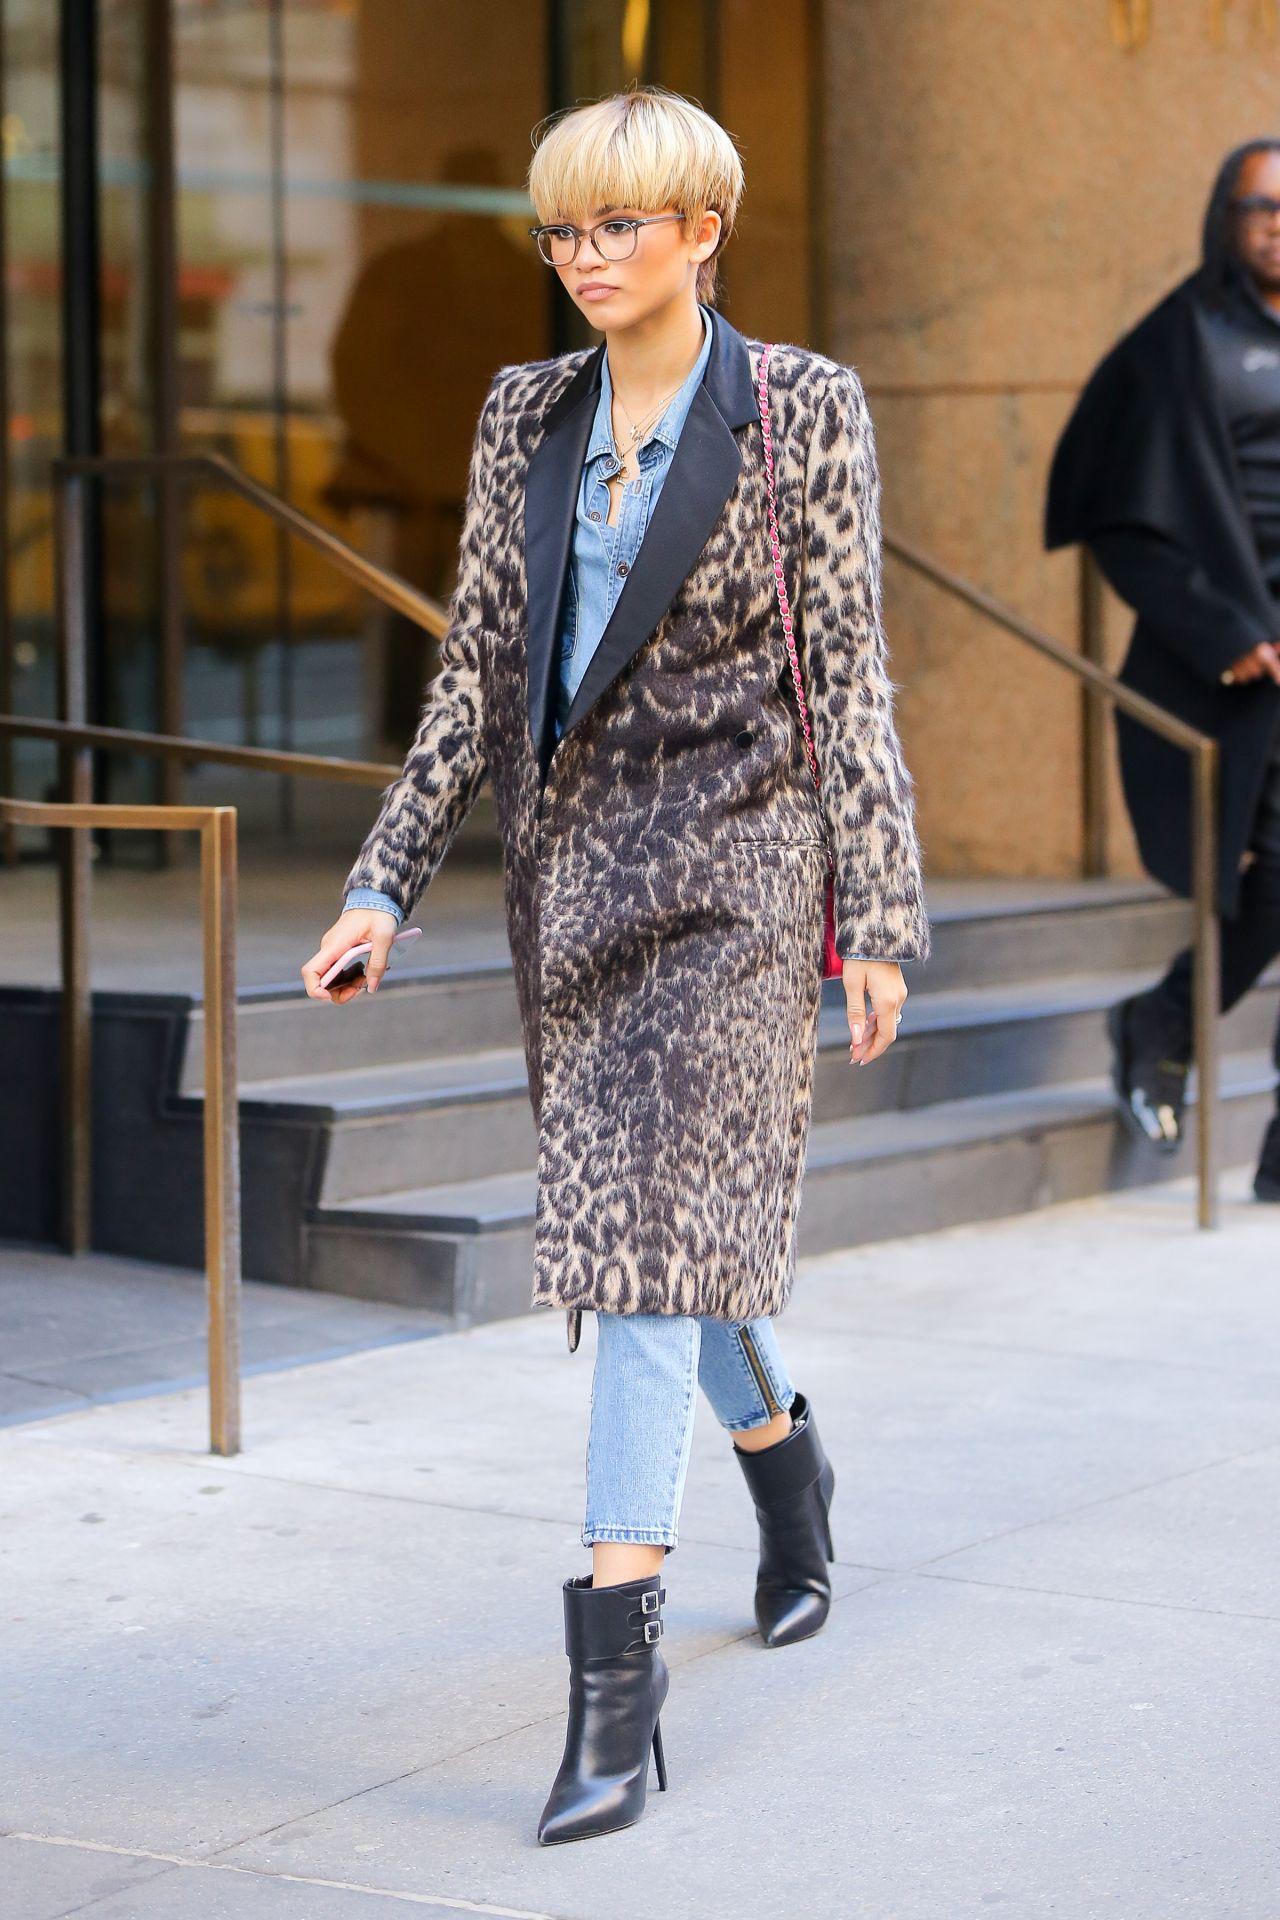 Zendaya Coleman Street Fashion